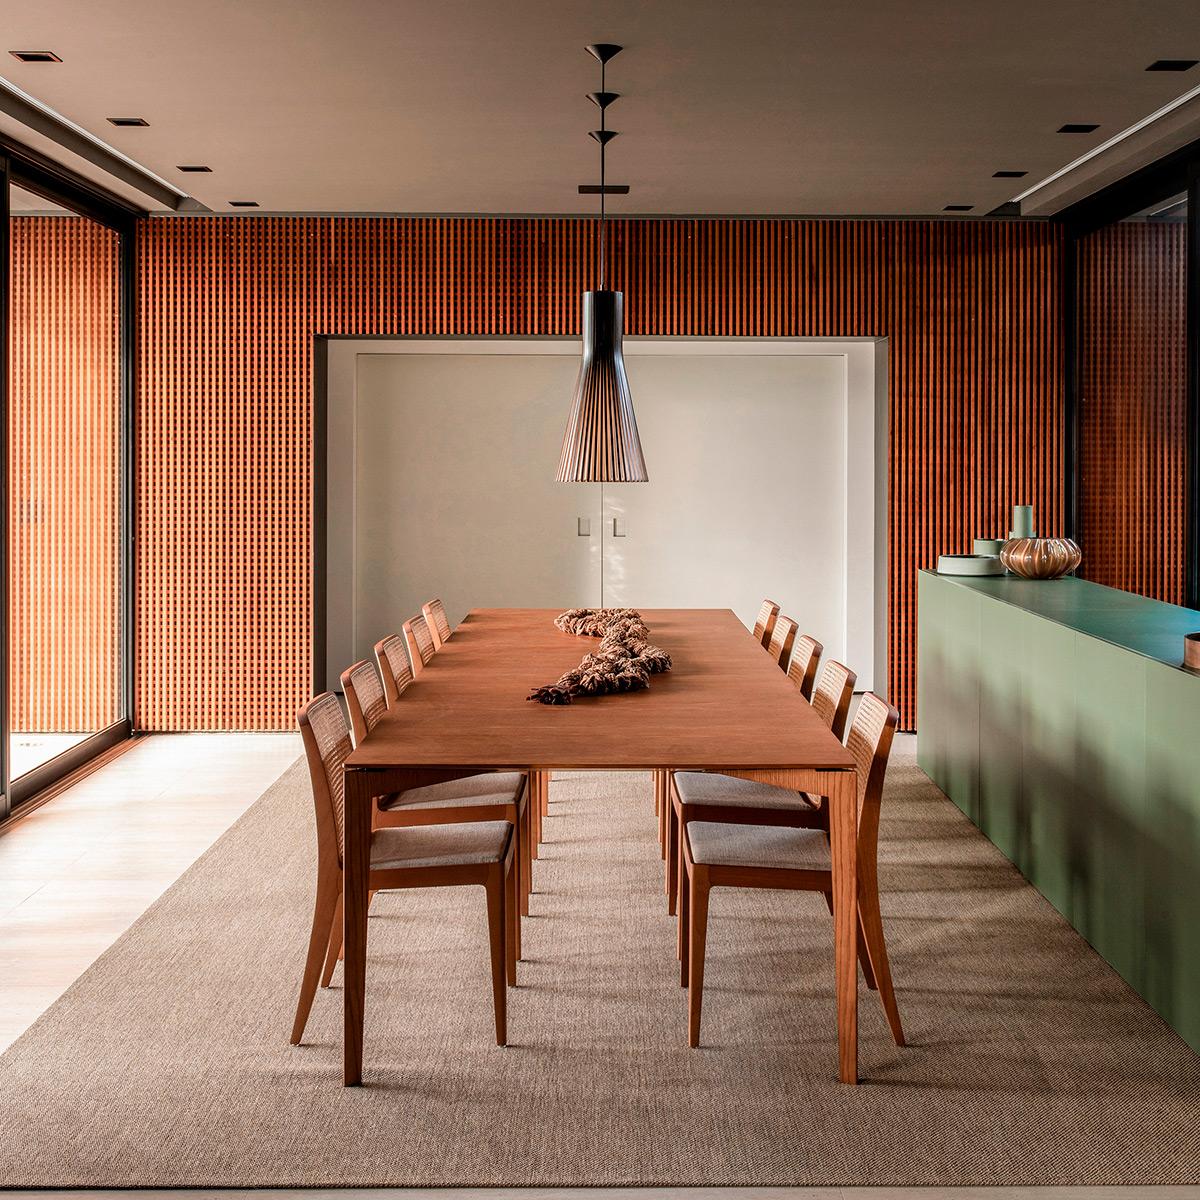 Casa-Cobogos-MF-Arquitetos-Felipe-Araujo-04